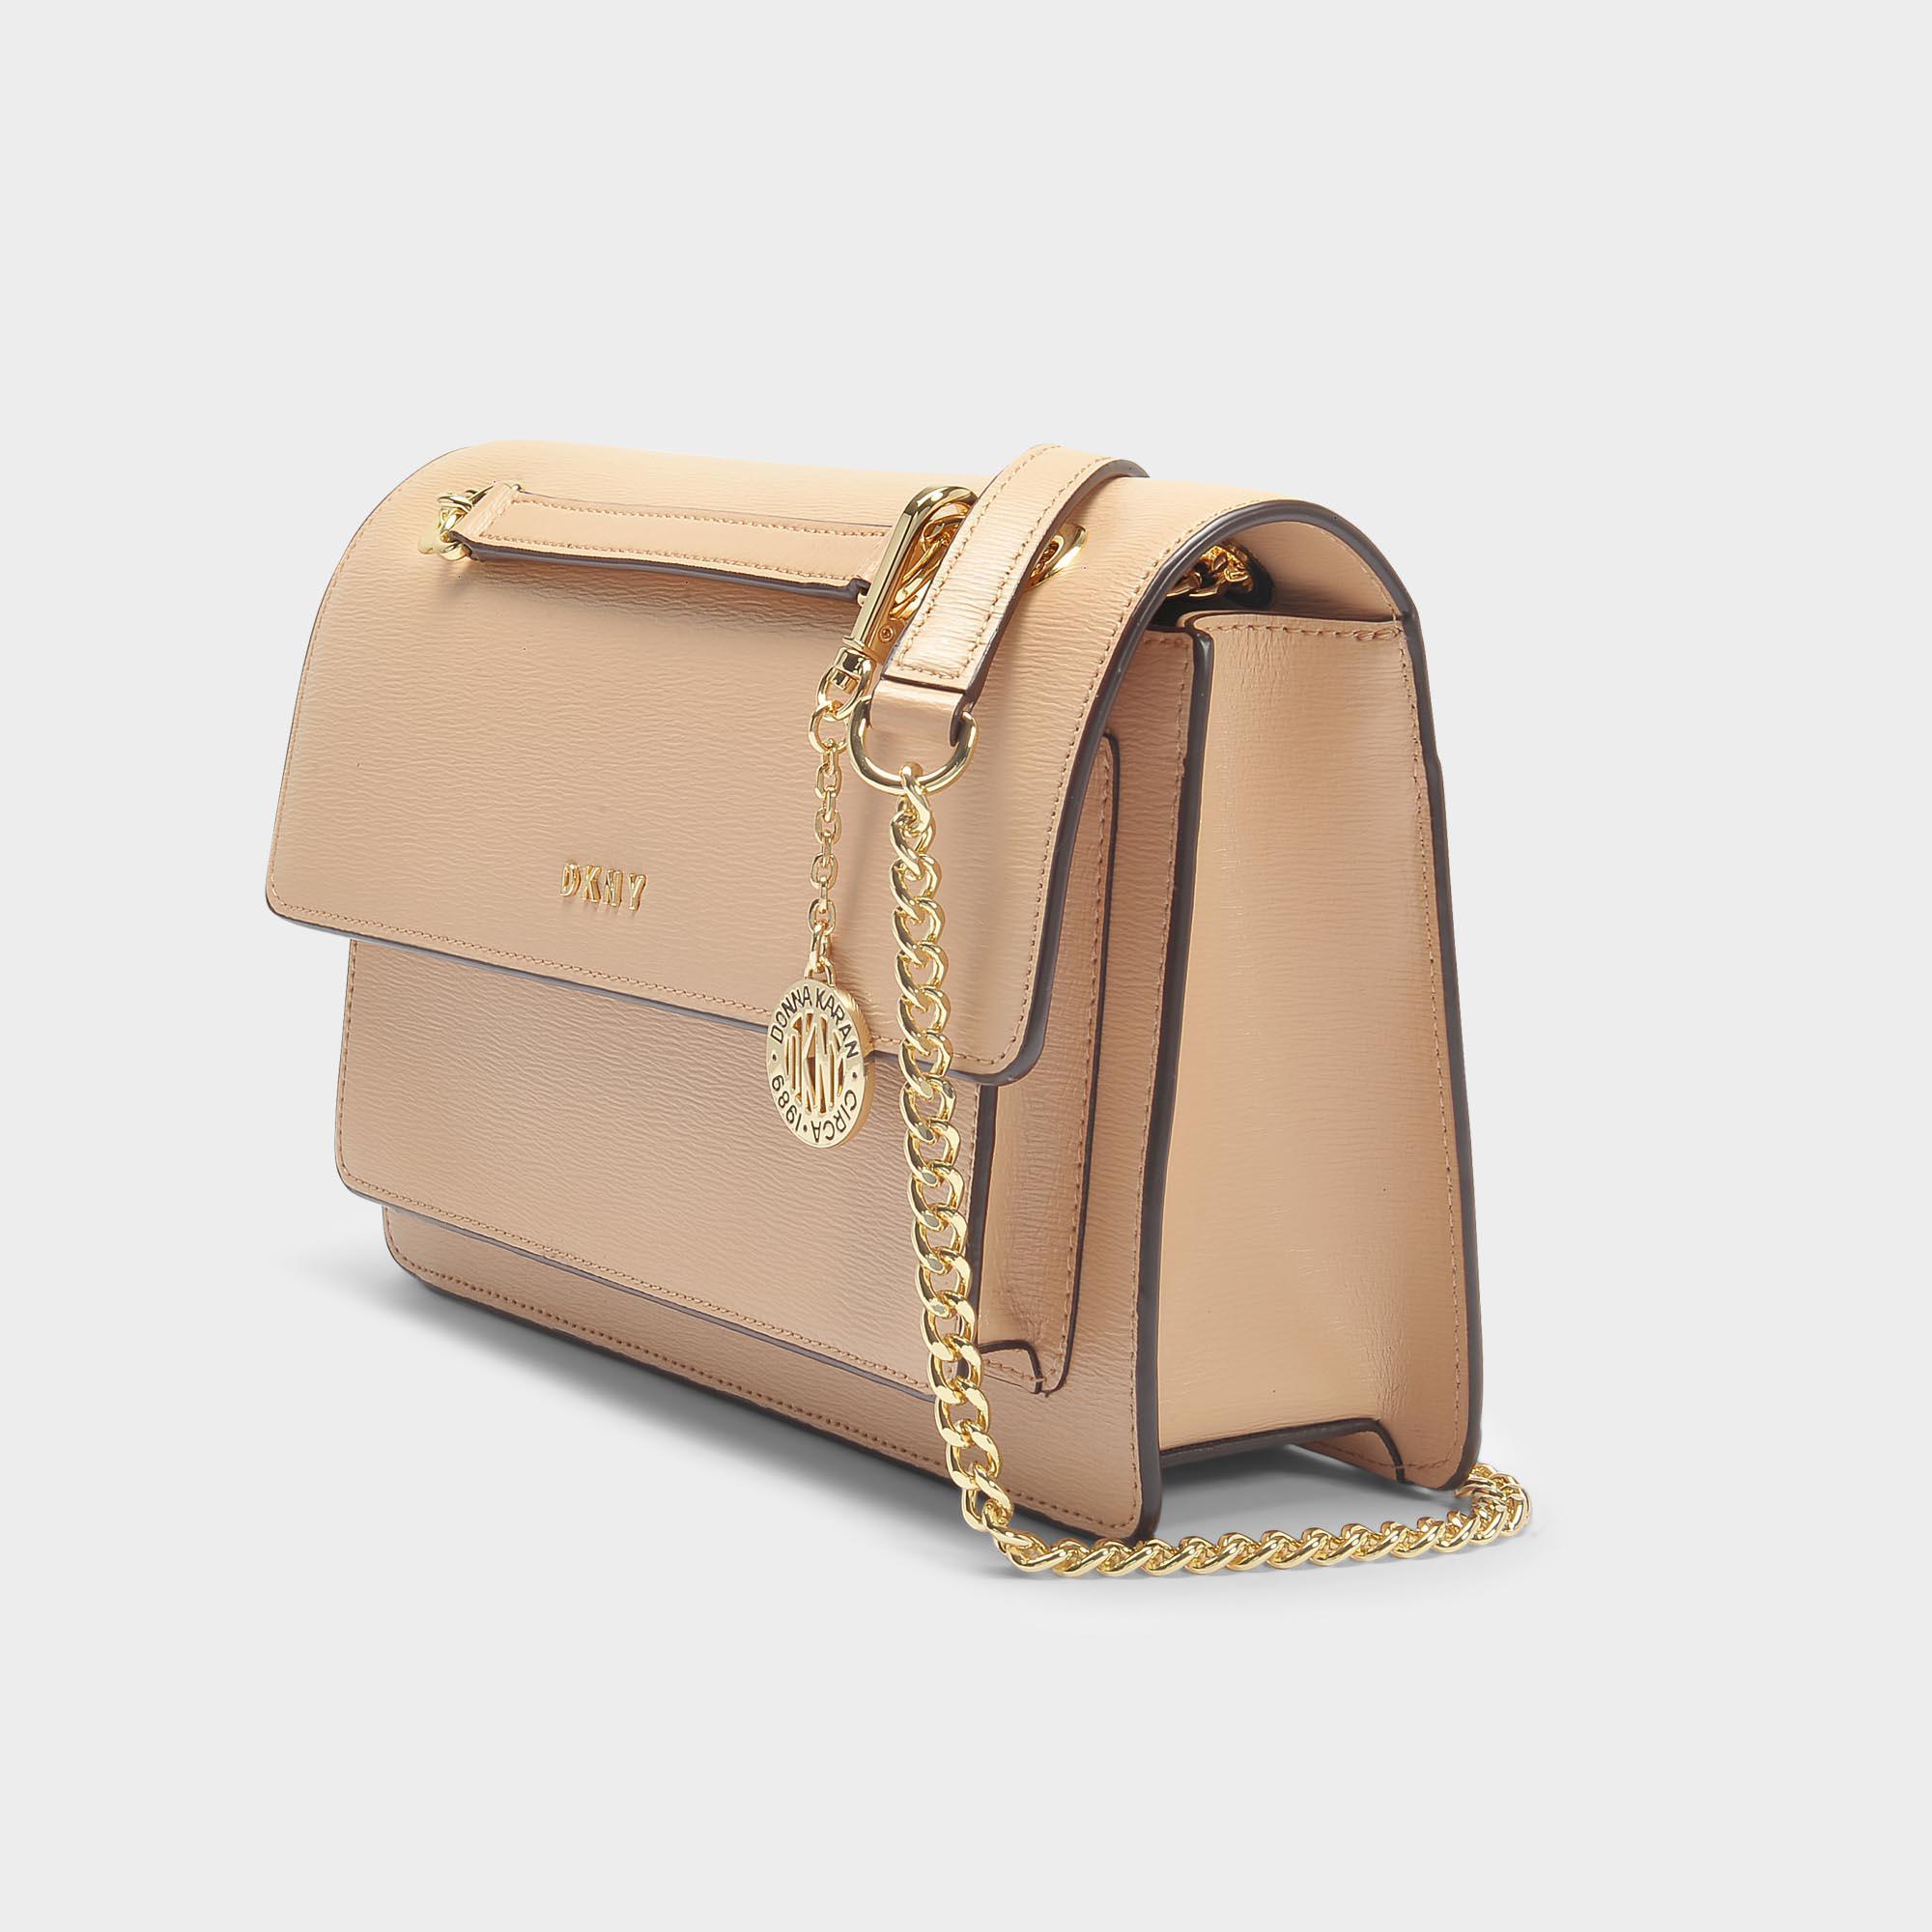 8e1259049af DKNY Bryant Large Chain Flap Crossbody Bag In Egg Nog Sutton ...